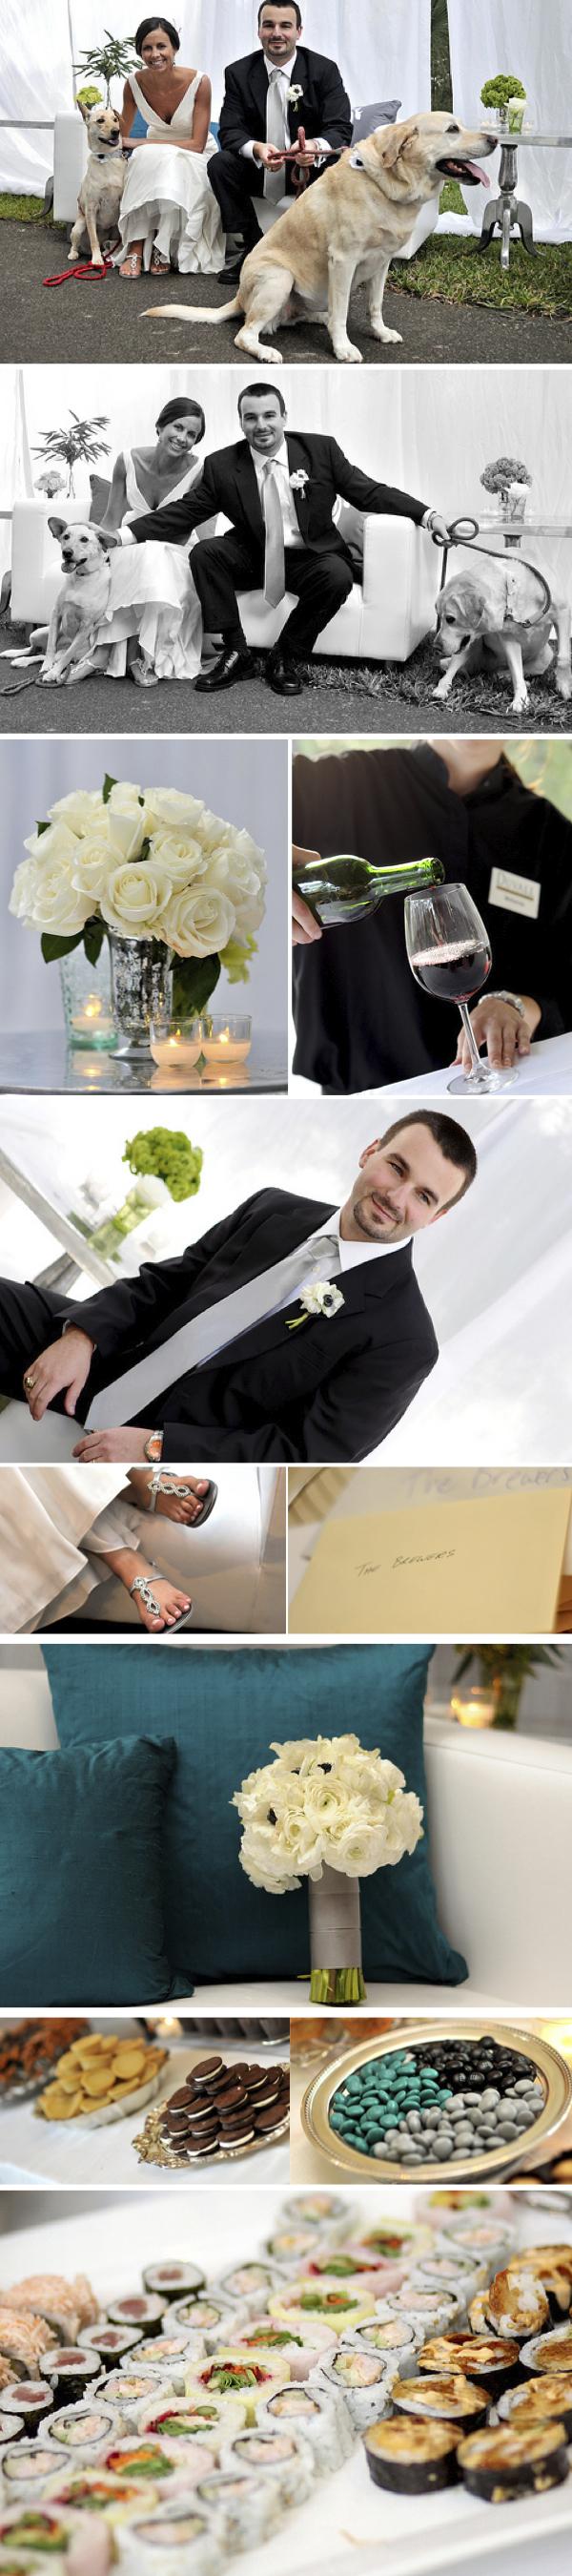 wedding blogs